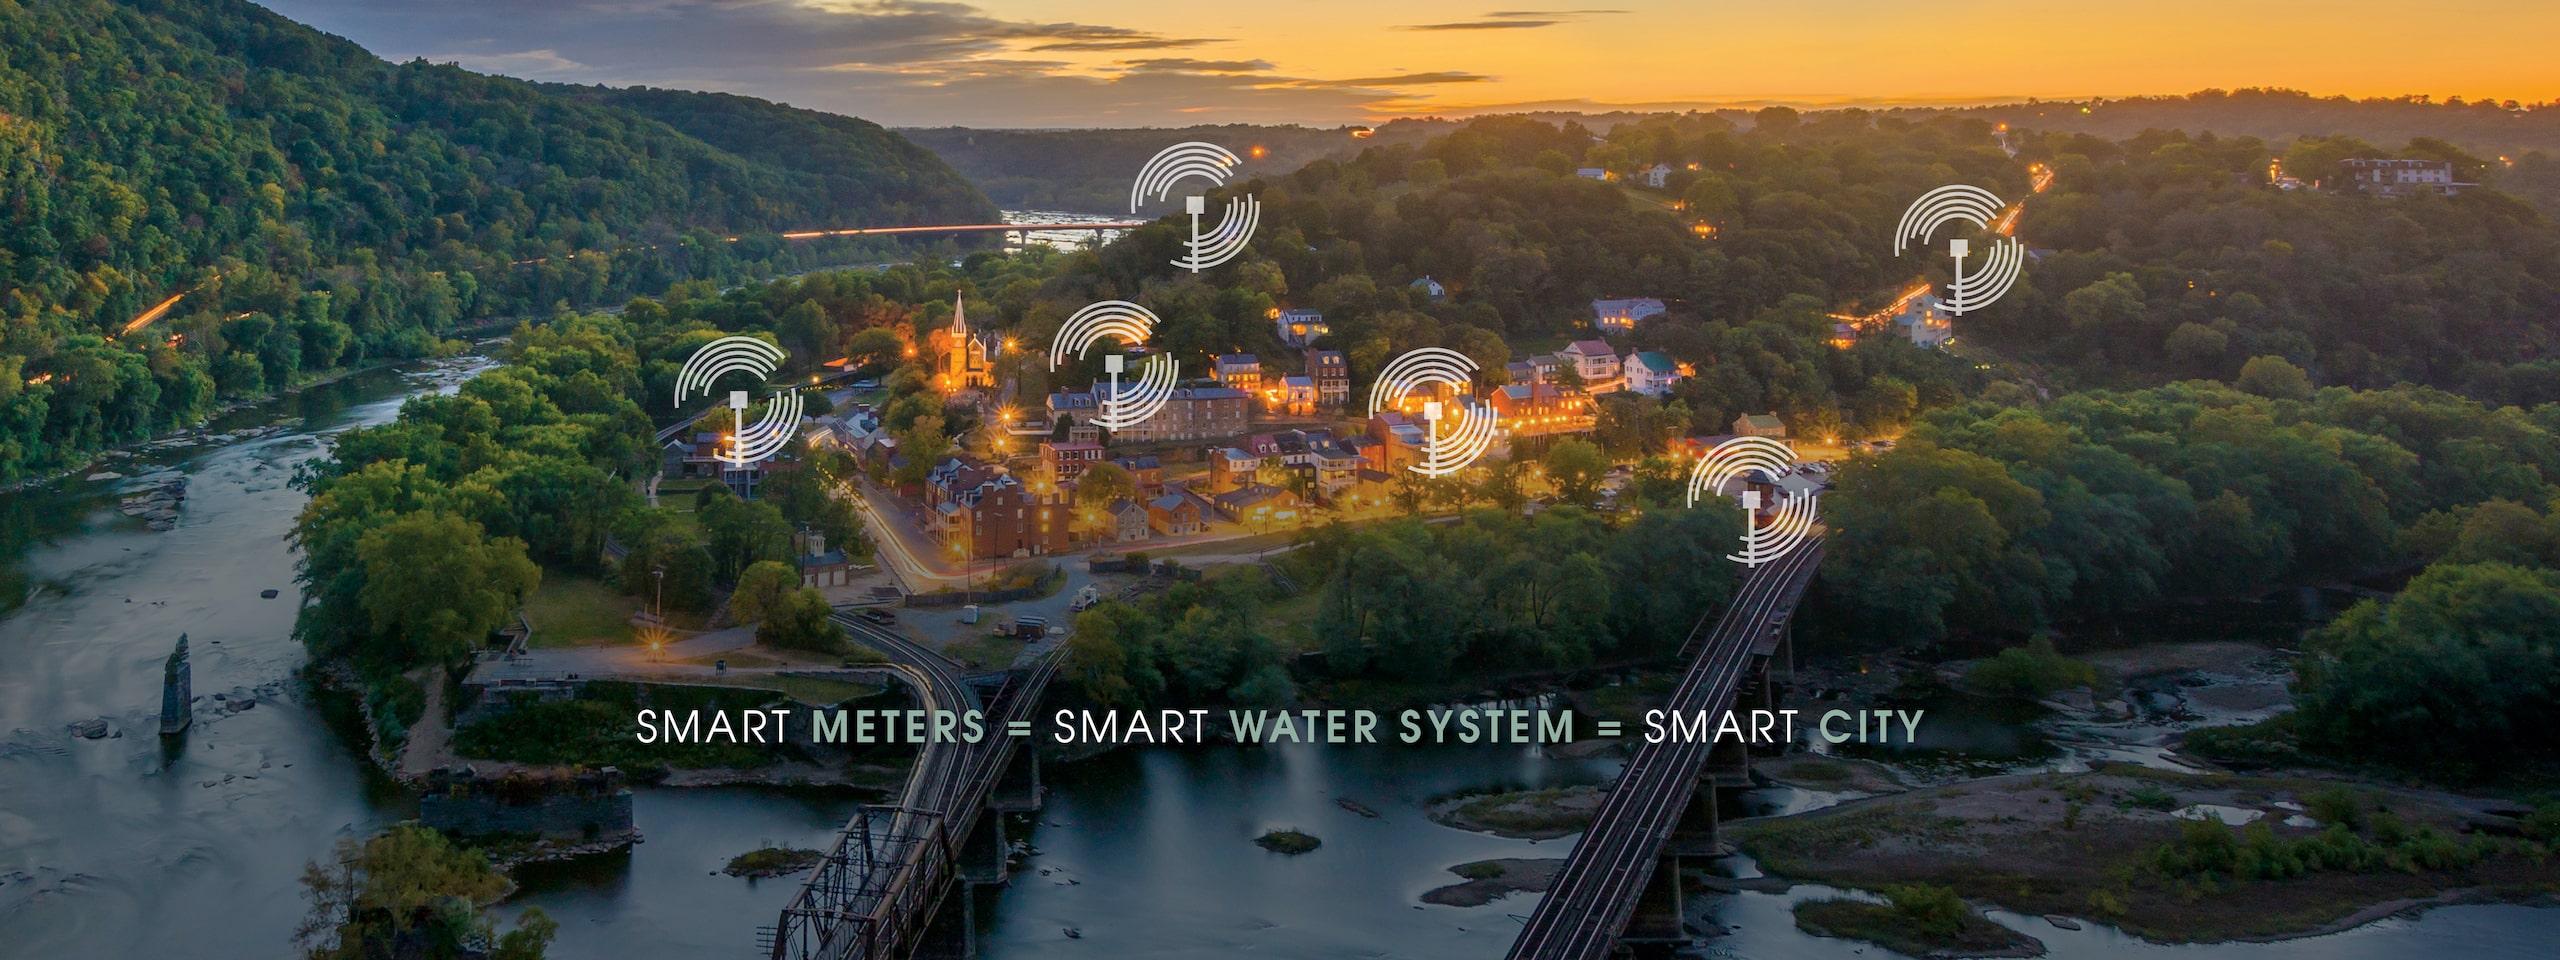 CITCO Water Smart City